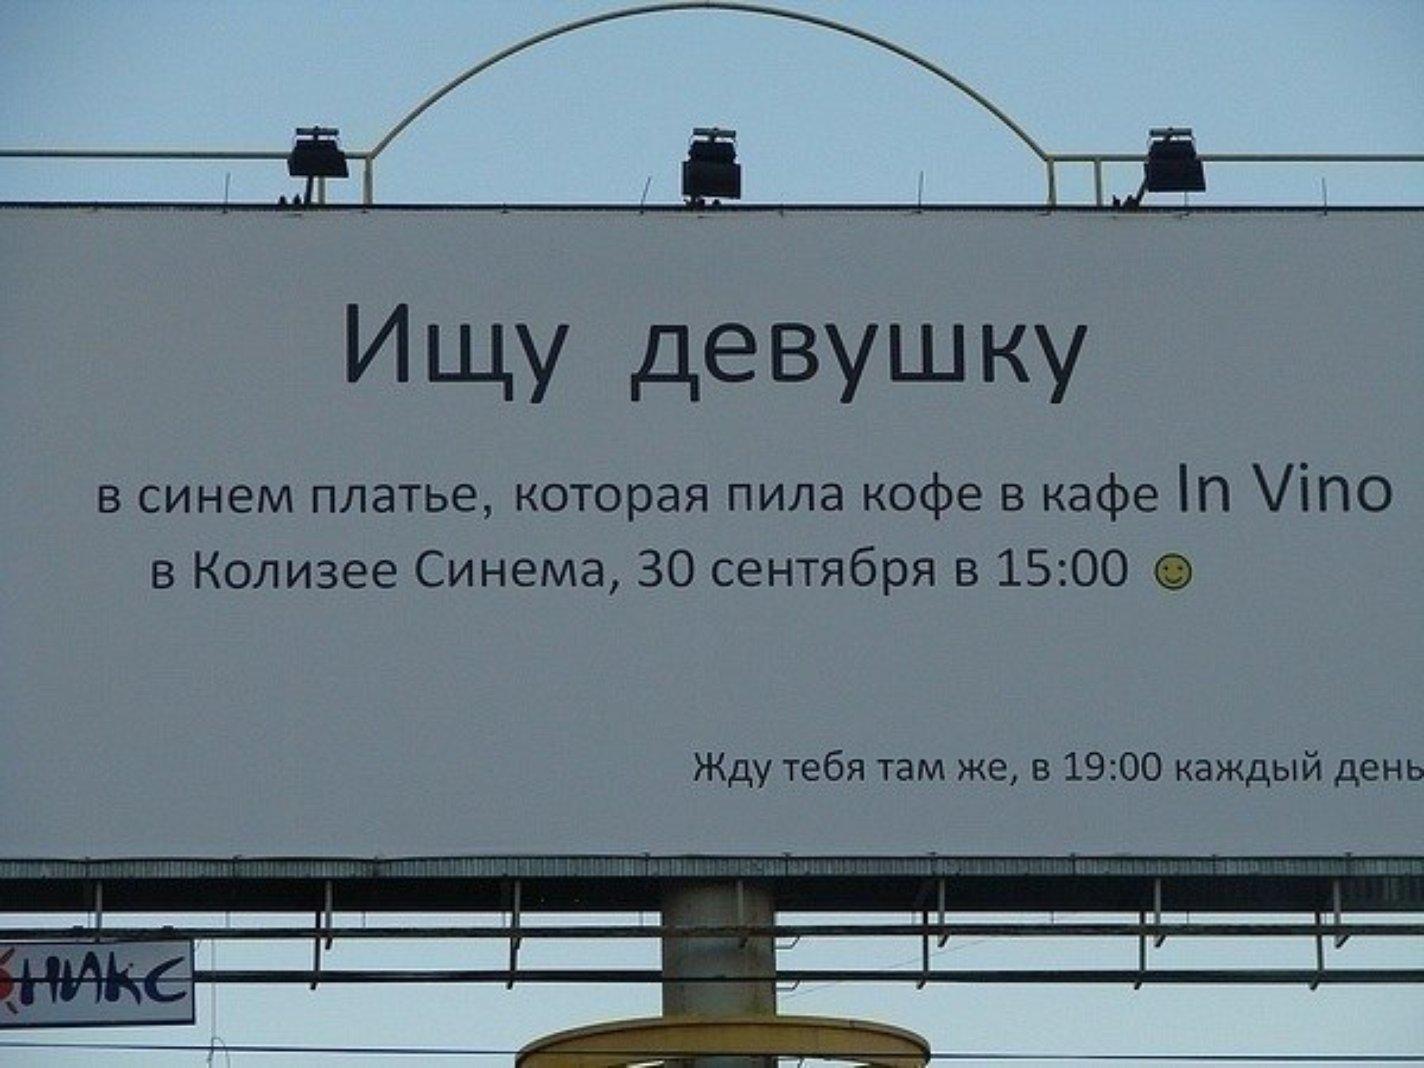 Типография Аэропорт